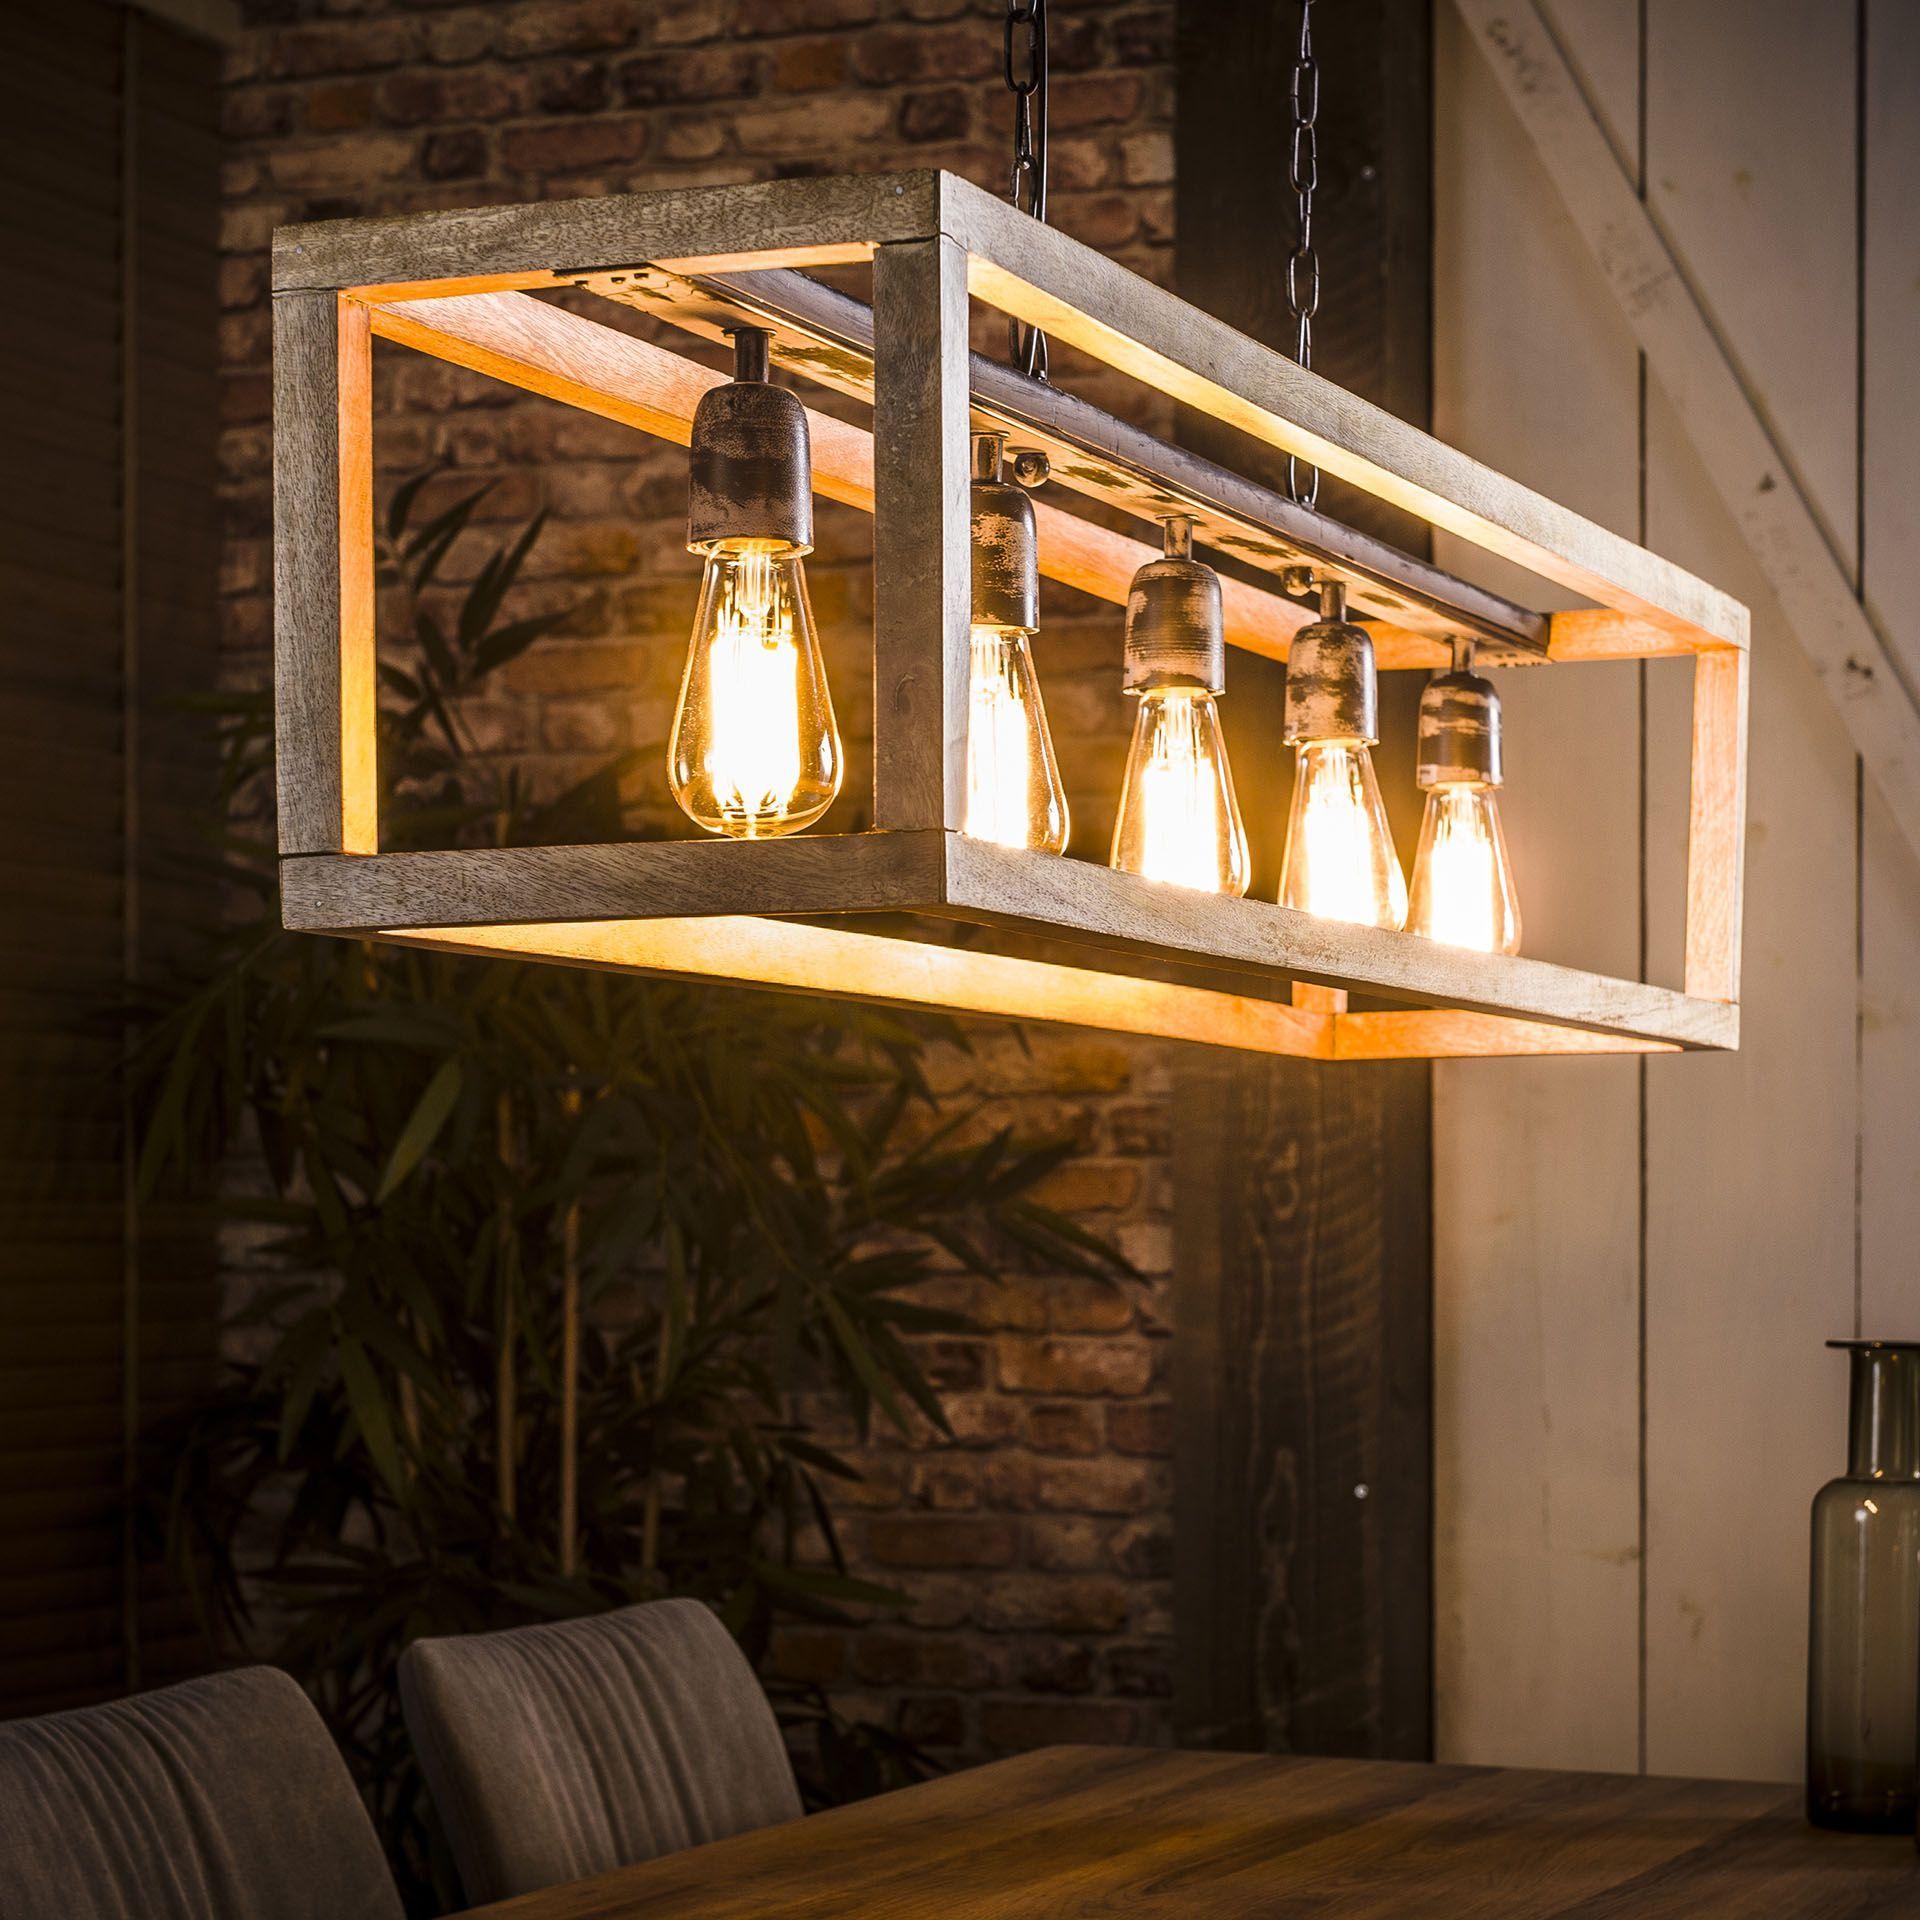 Pendelleuchte Lampe Deckenlampe Holz Beleuchtung